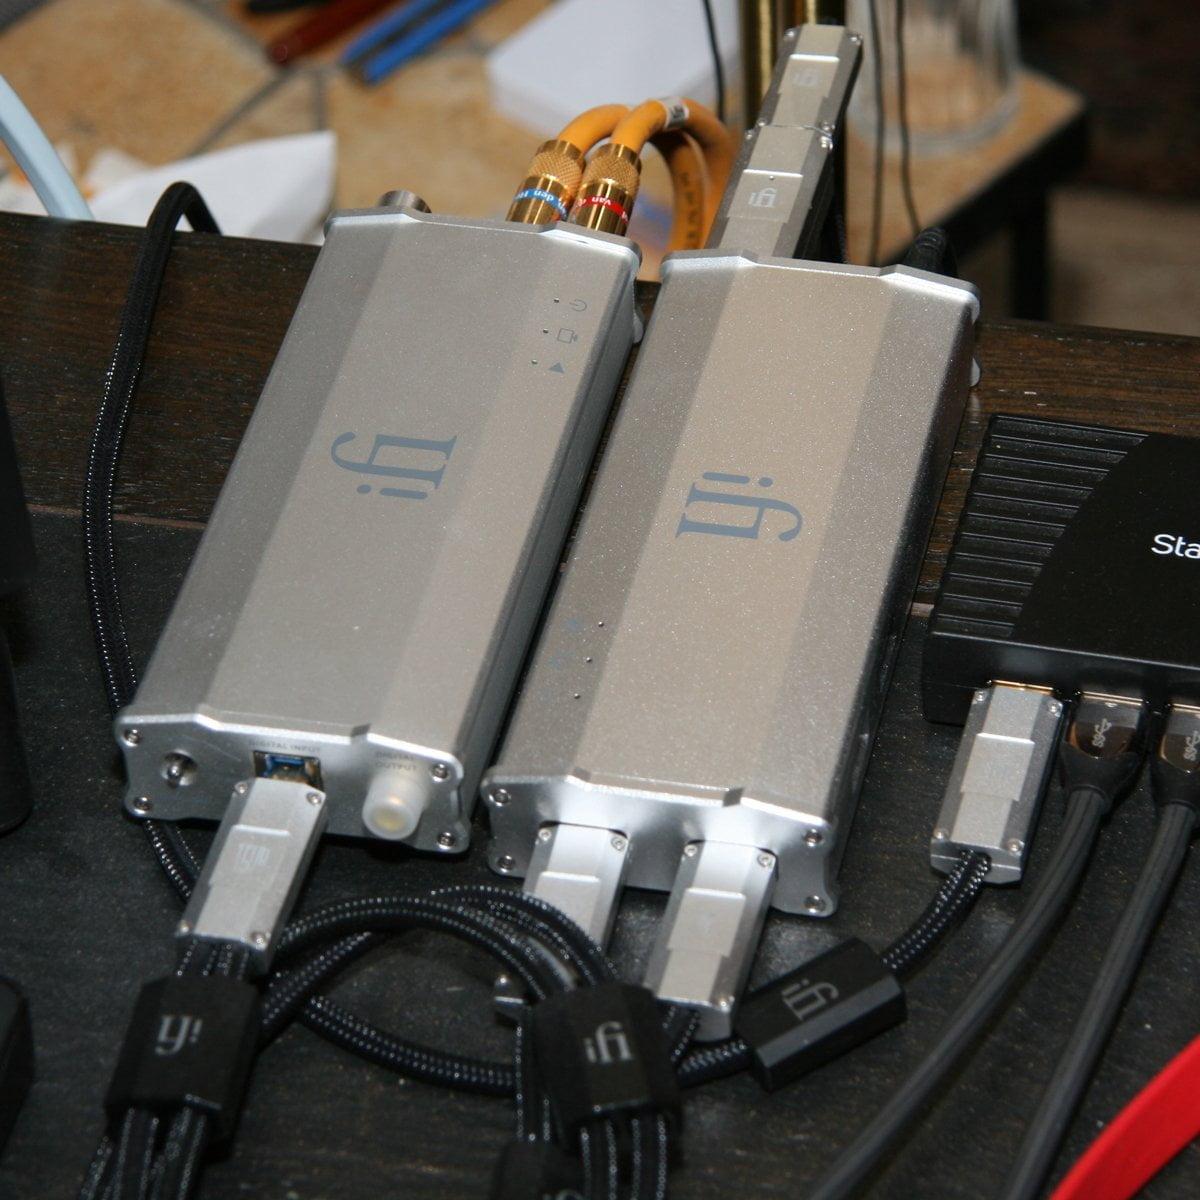 iFi-iDAC2-iUSB-3.0-iPurifier